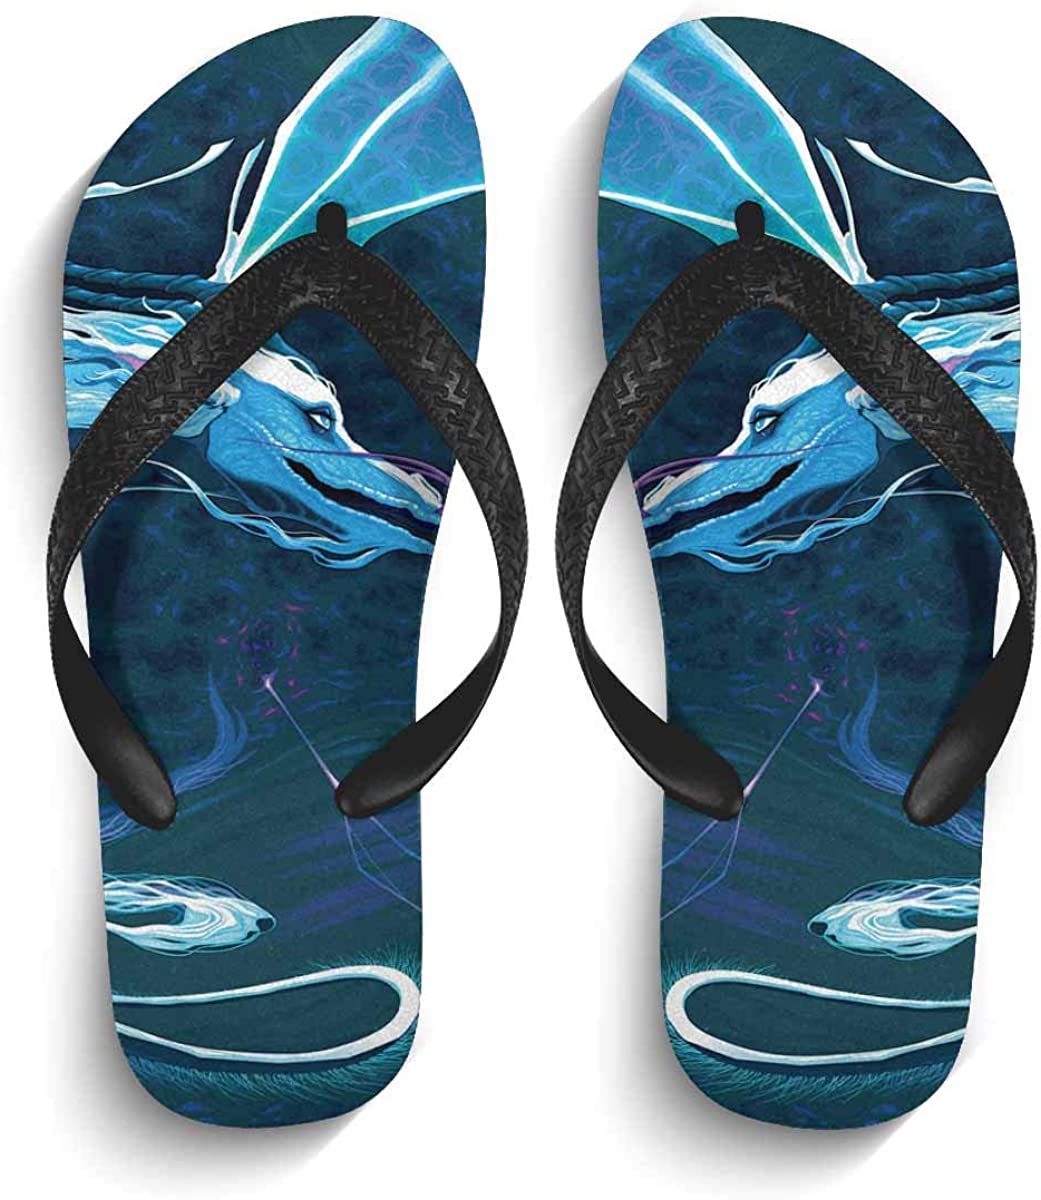 INTERESTPRINT Men's Non-Slip Flip Flops Wedding Card with Birds Thongs Sandals for Beach Lounging Home